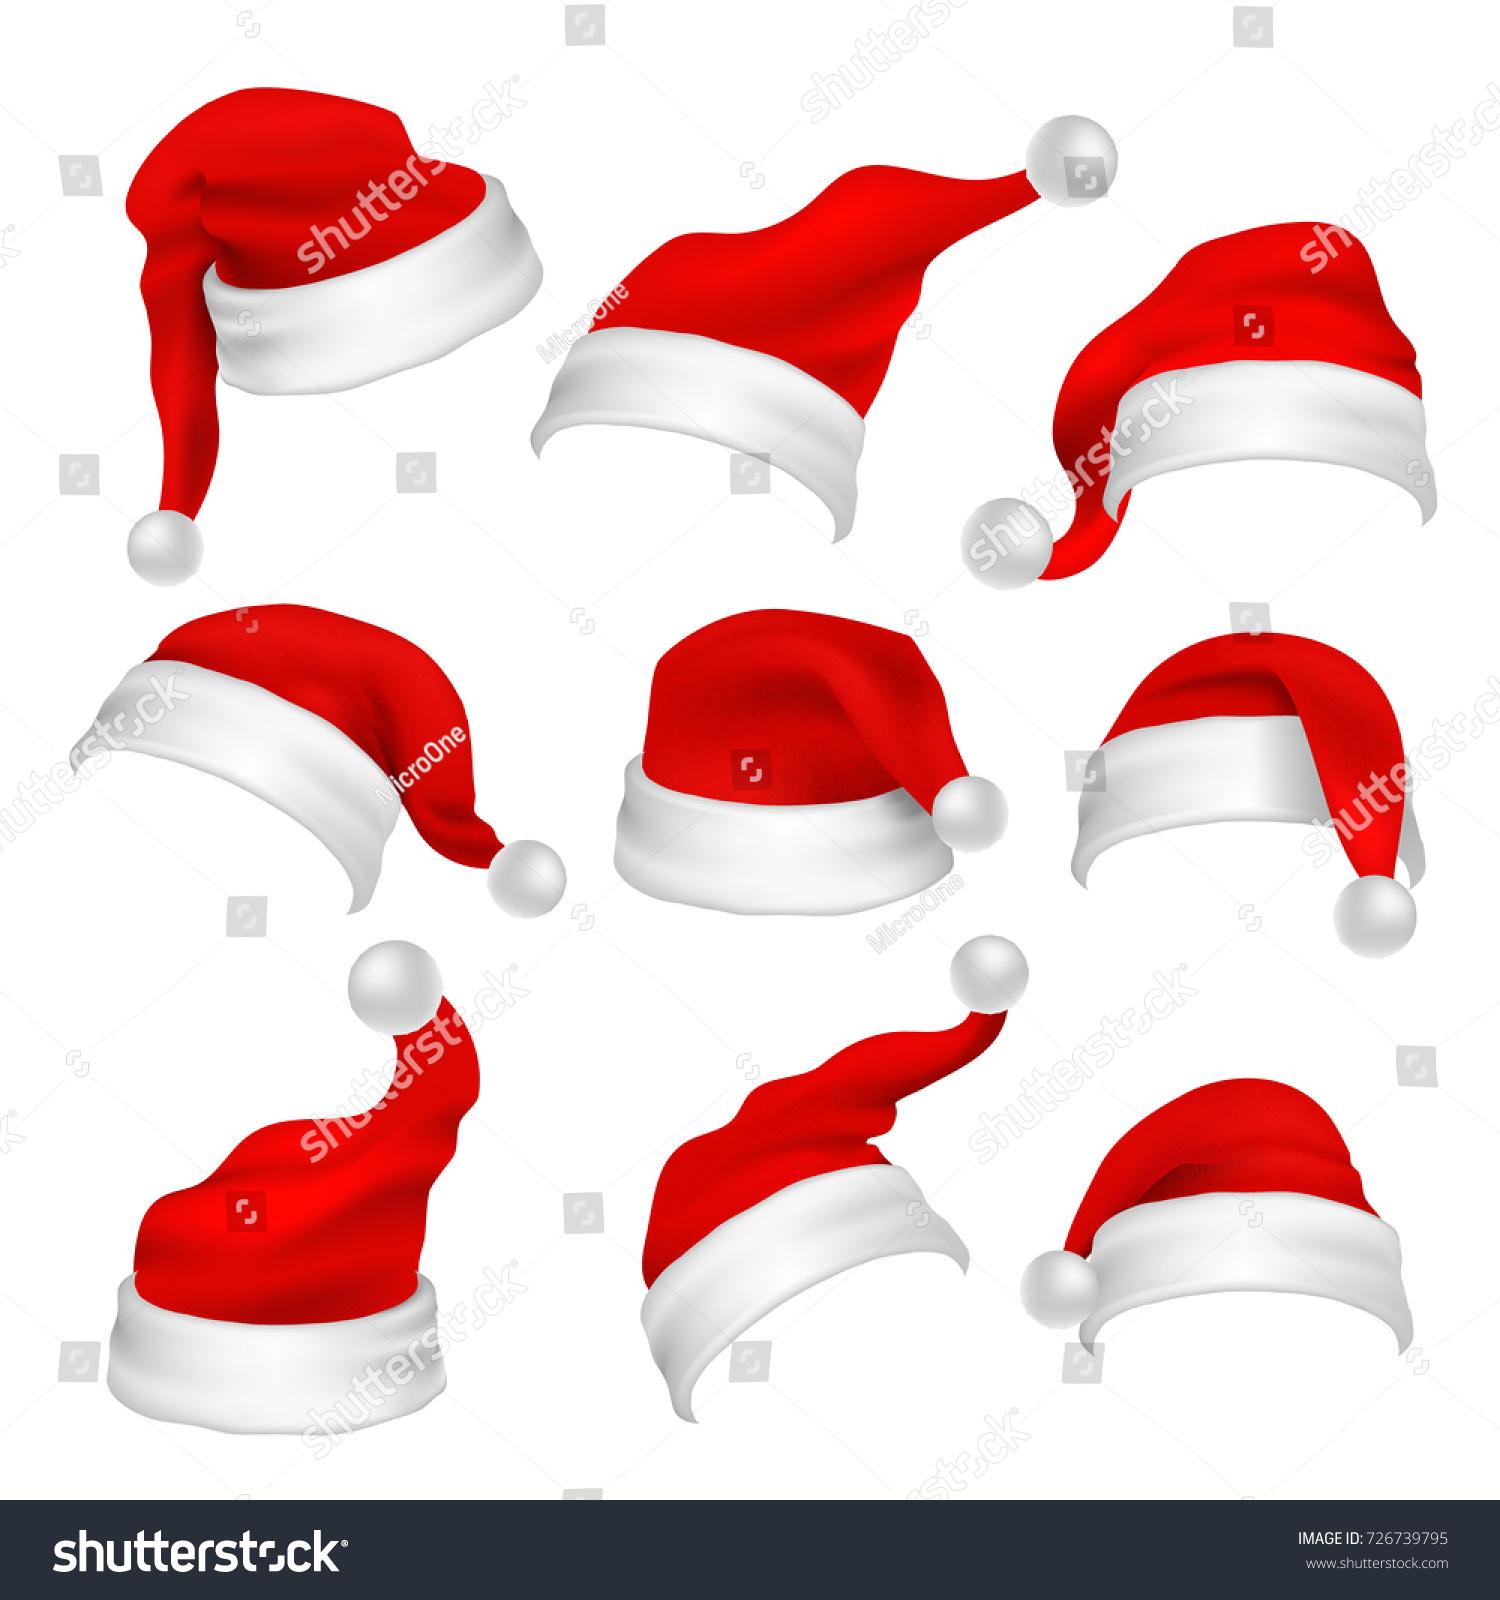 santa claus red hats photo booth props christmas holiday decoration vector elements santa claus - Santa Claus Red